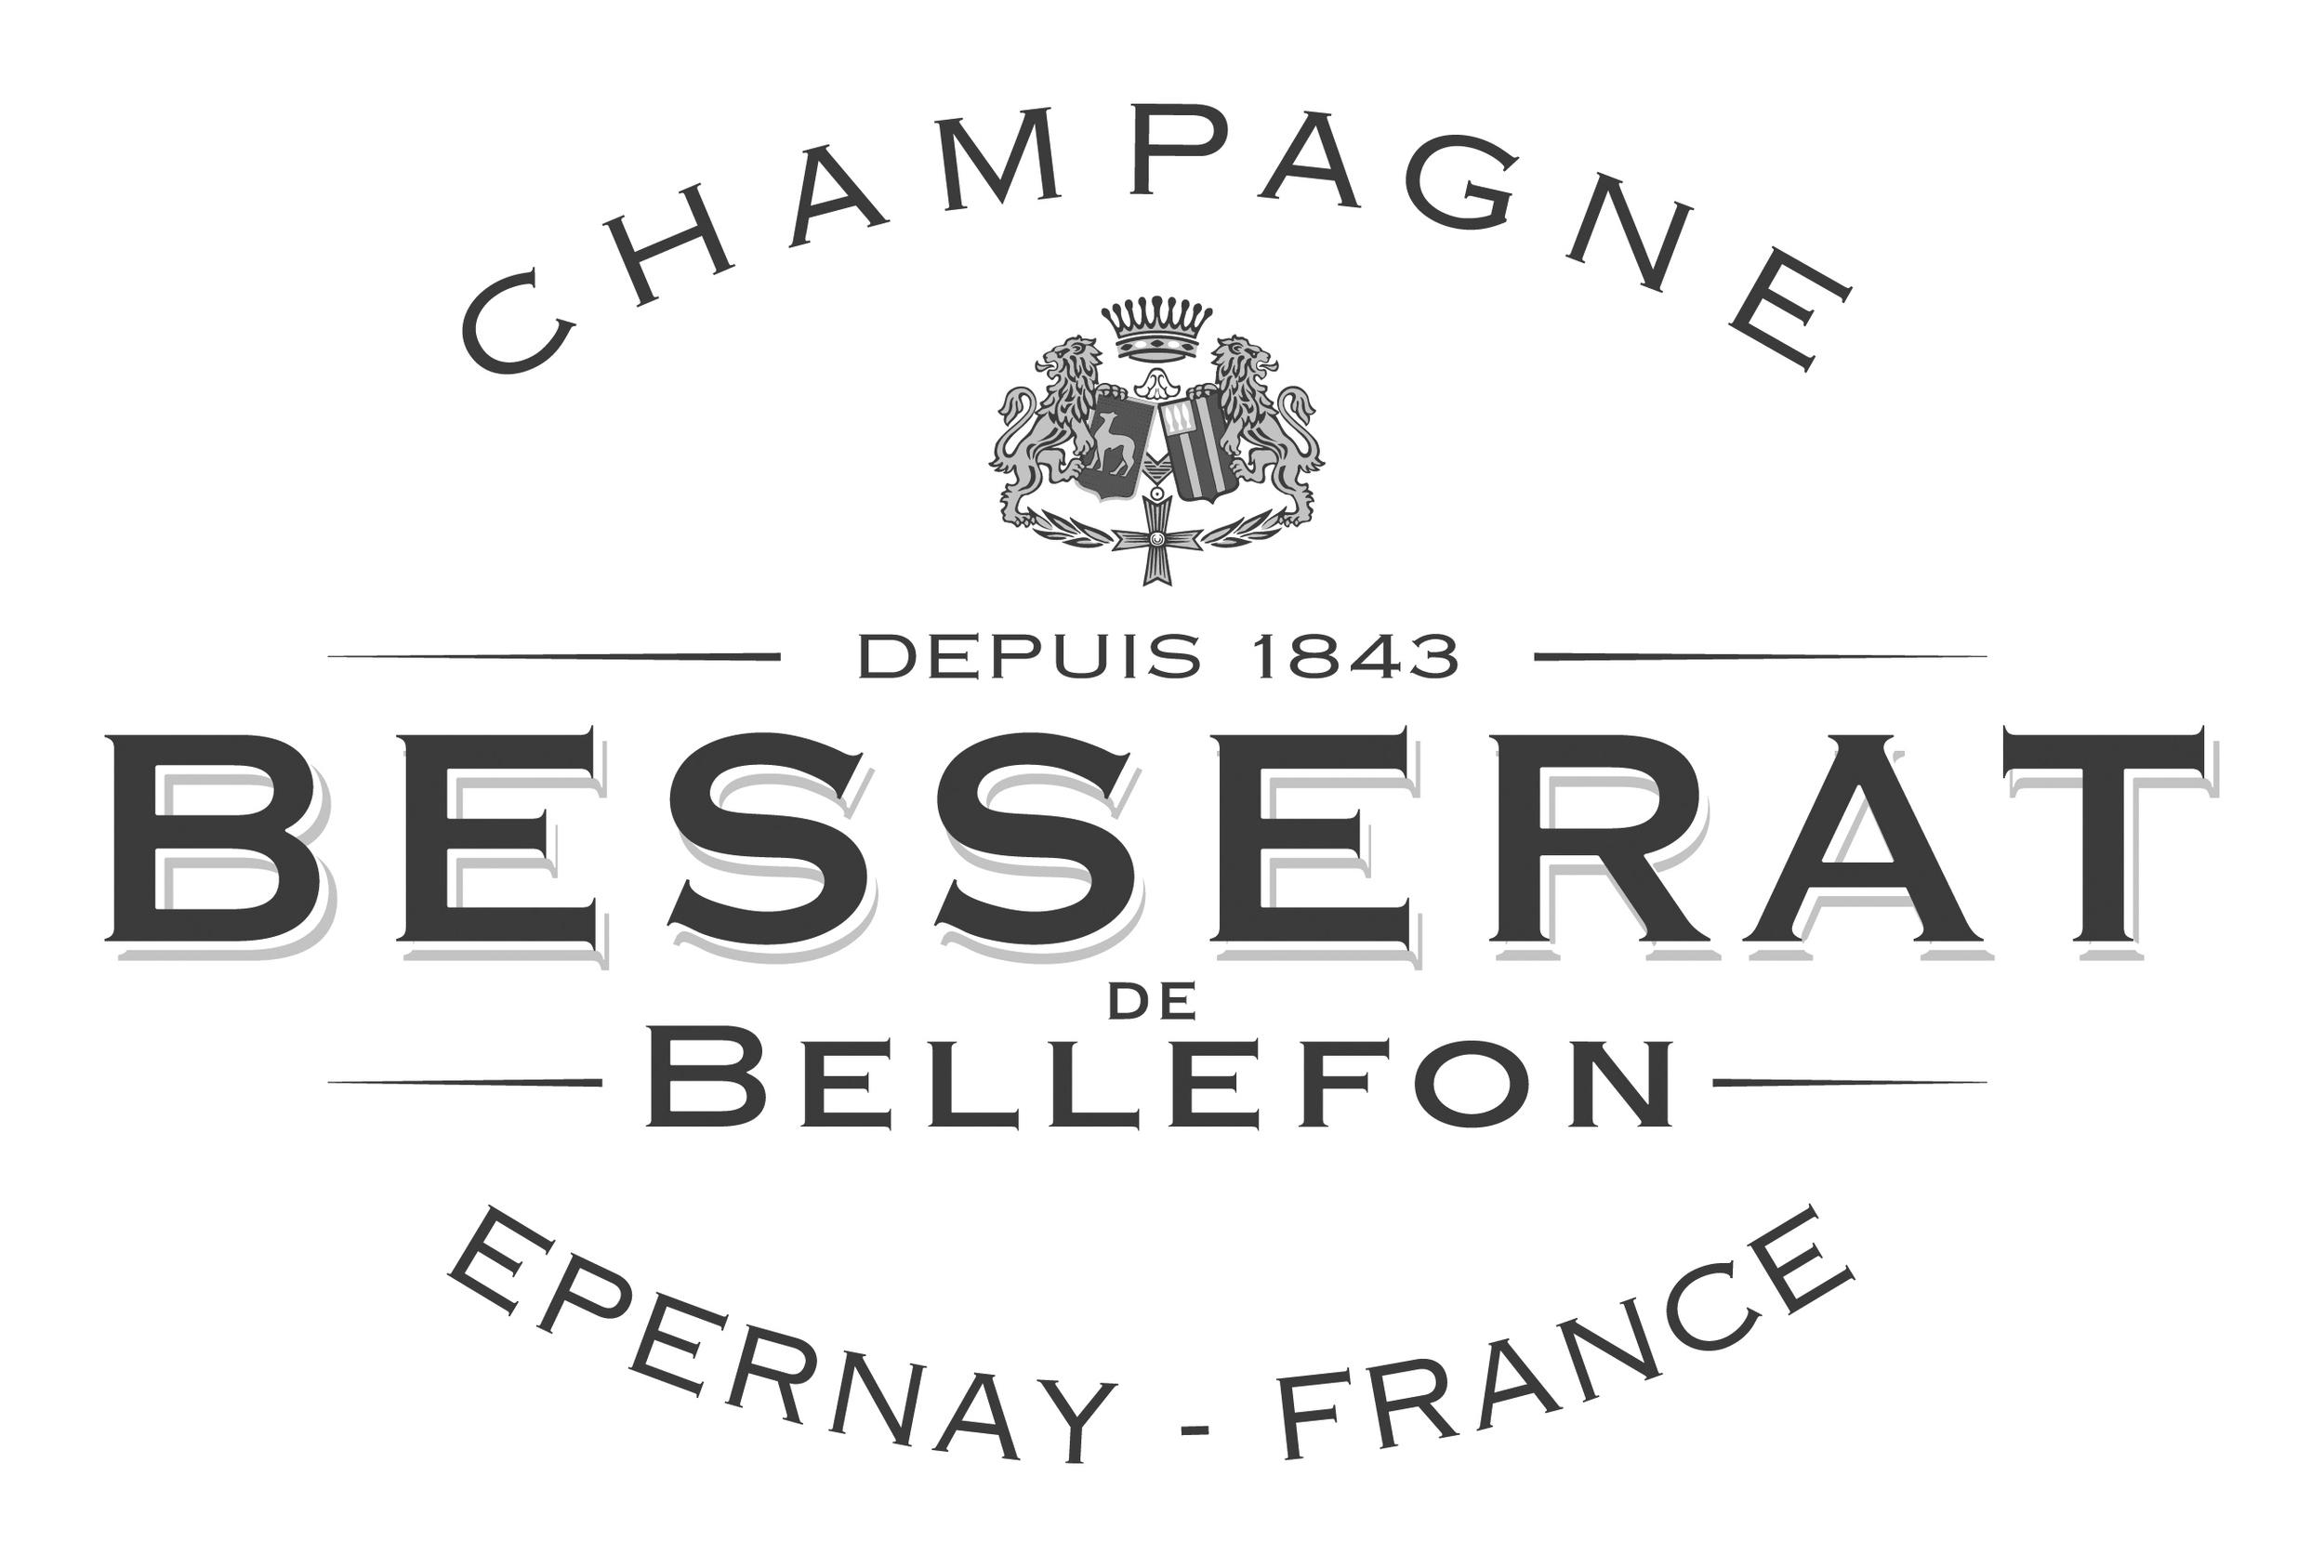 Logo_Institutionnel_Champagne_Besserat_de_Bellefon.jpg